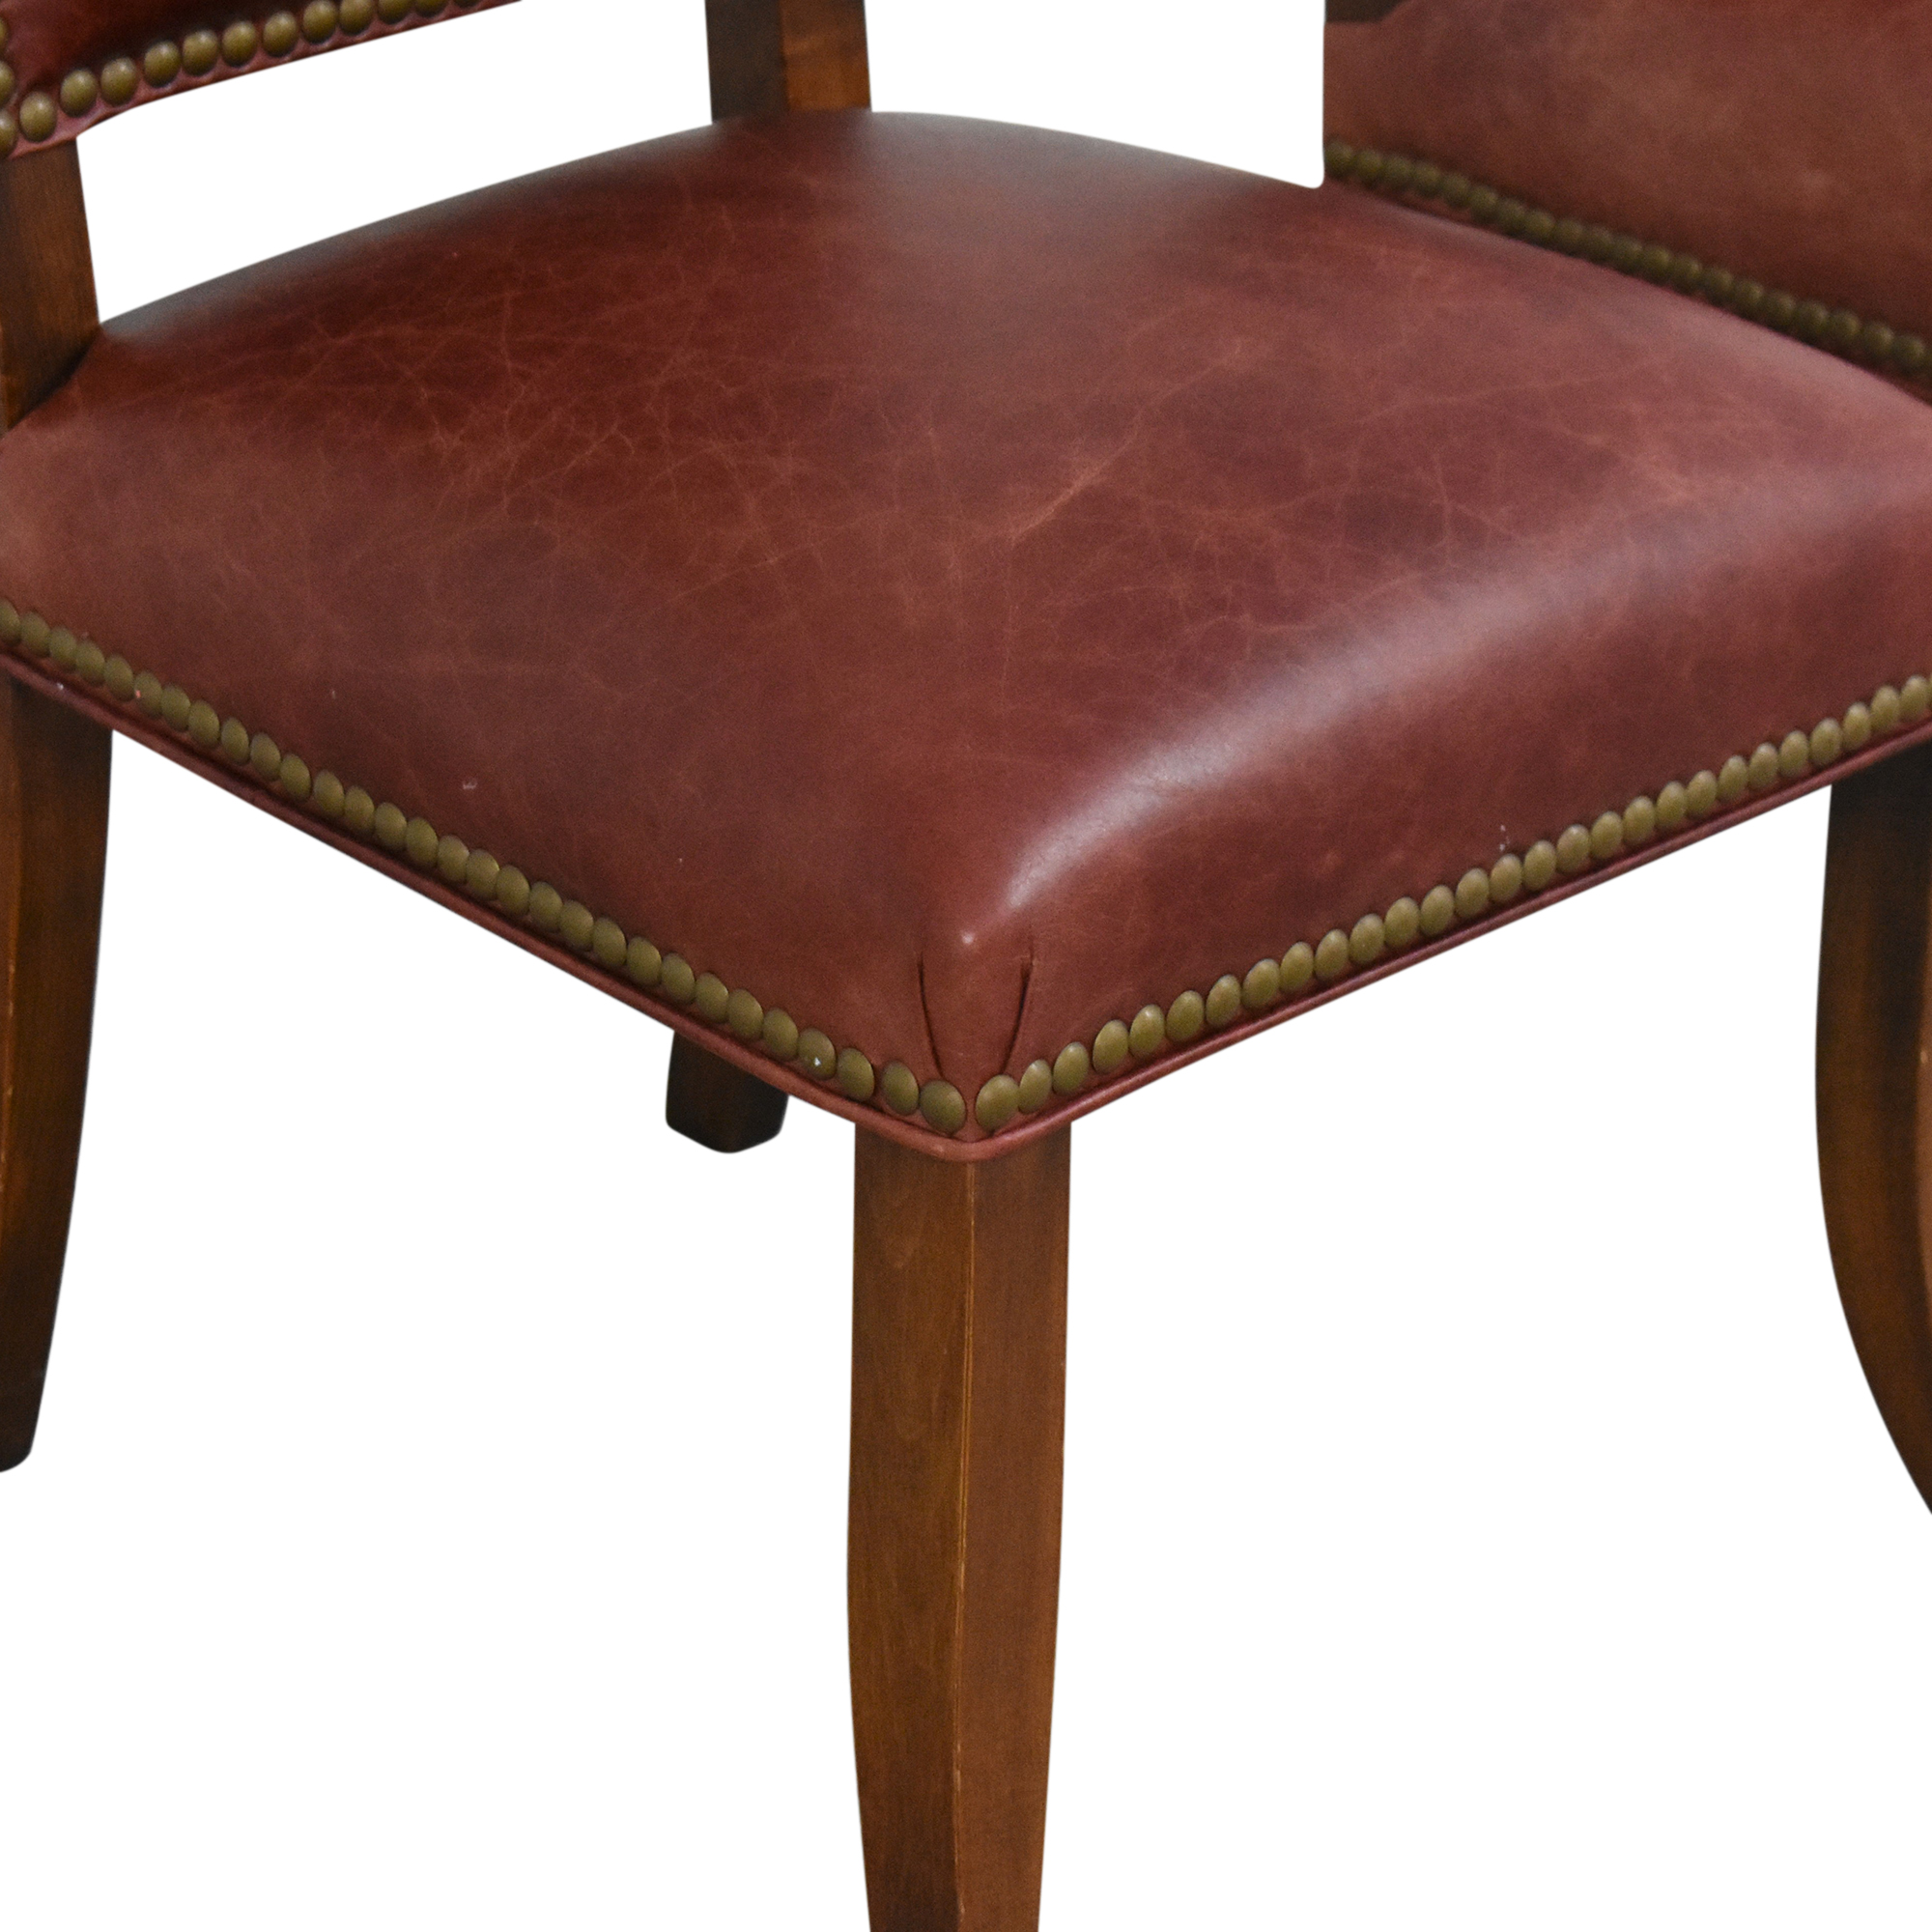 Ethan Allen Ethan Allen Nailhead Dining Side Chairs ma